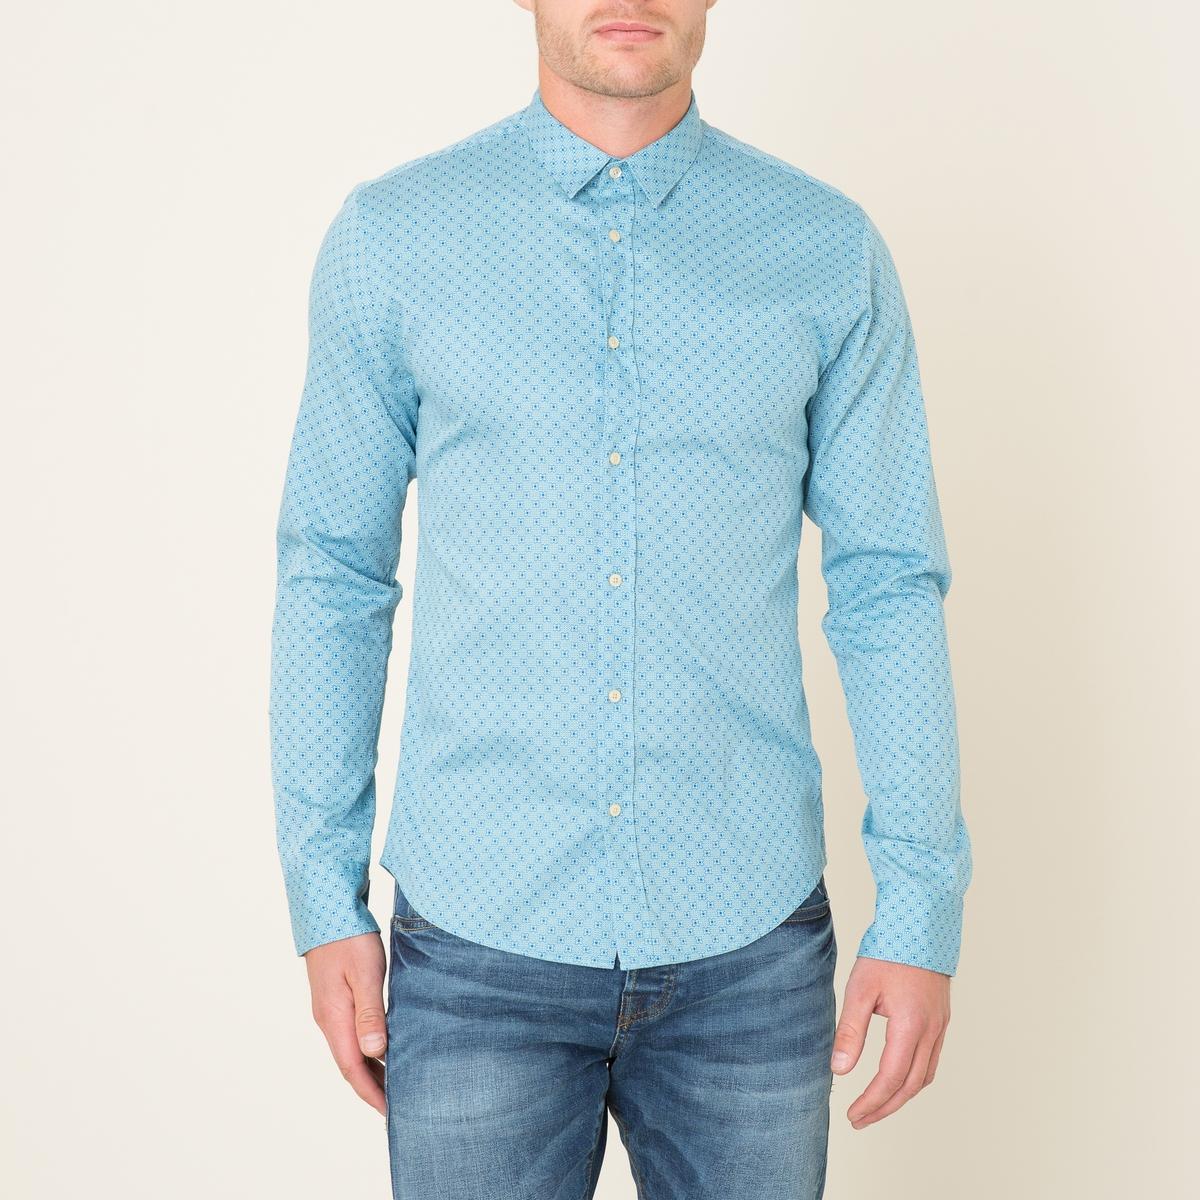 Рубашка с рисункомСостав и описание    Материал : 100% хлопокМарка : SCOTCH AND SODA<br><br>Цвет: синий